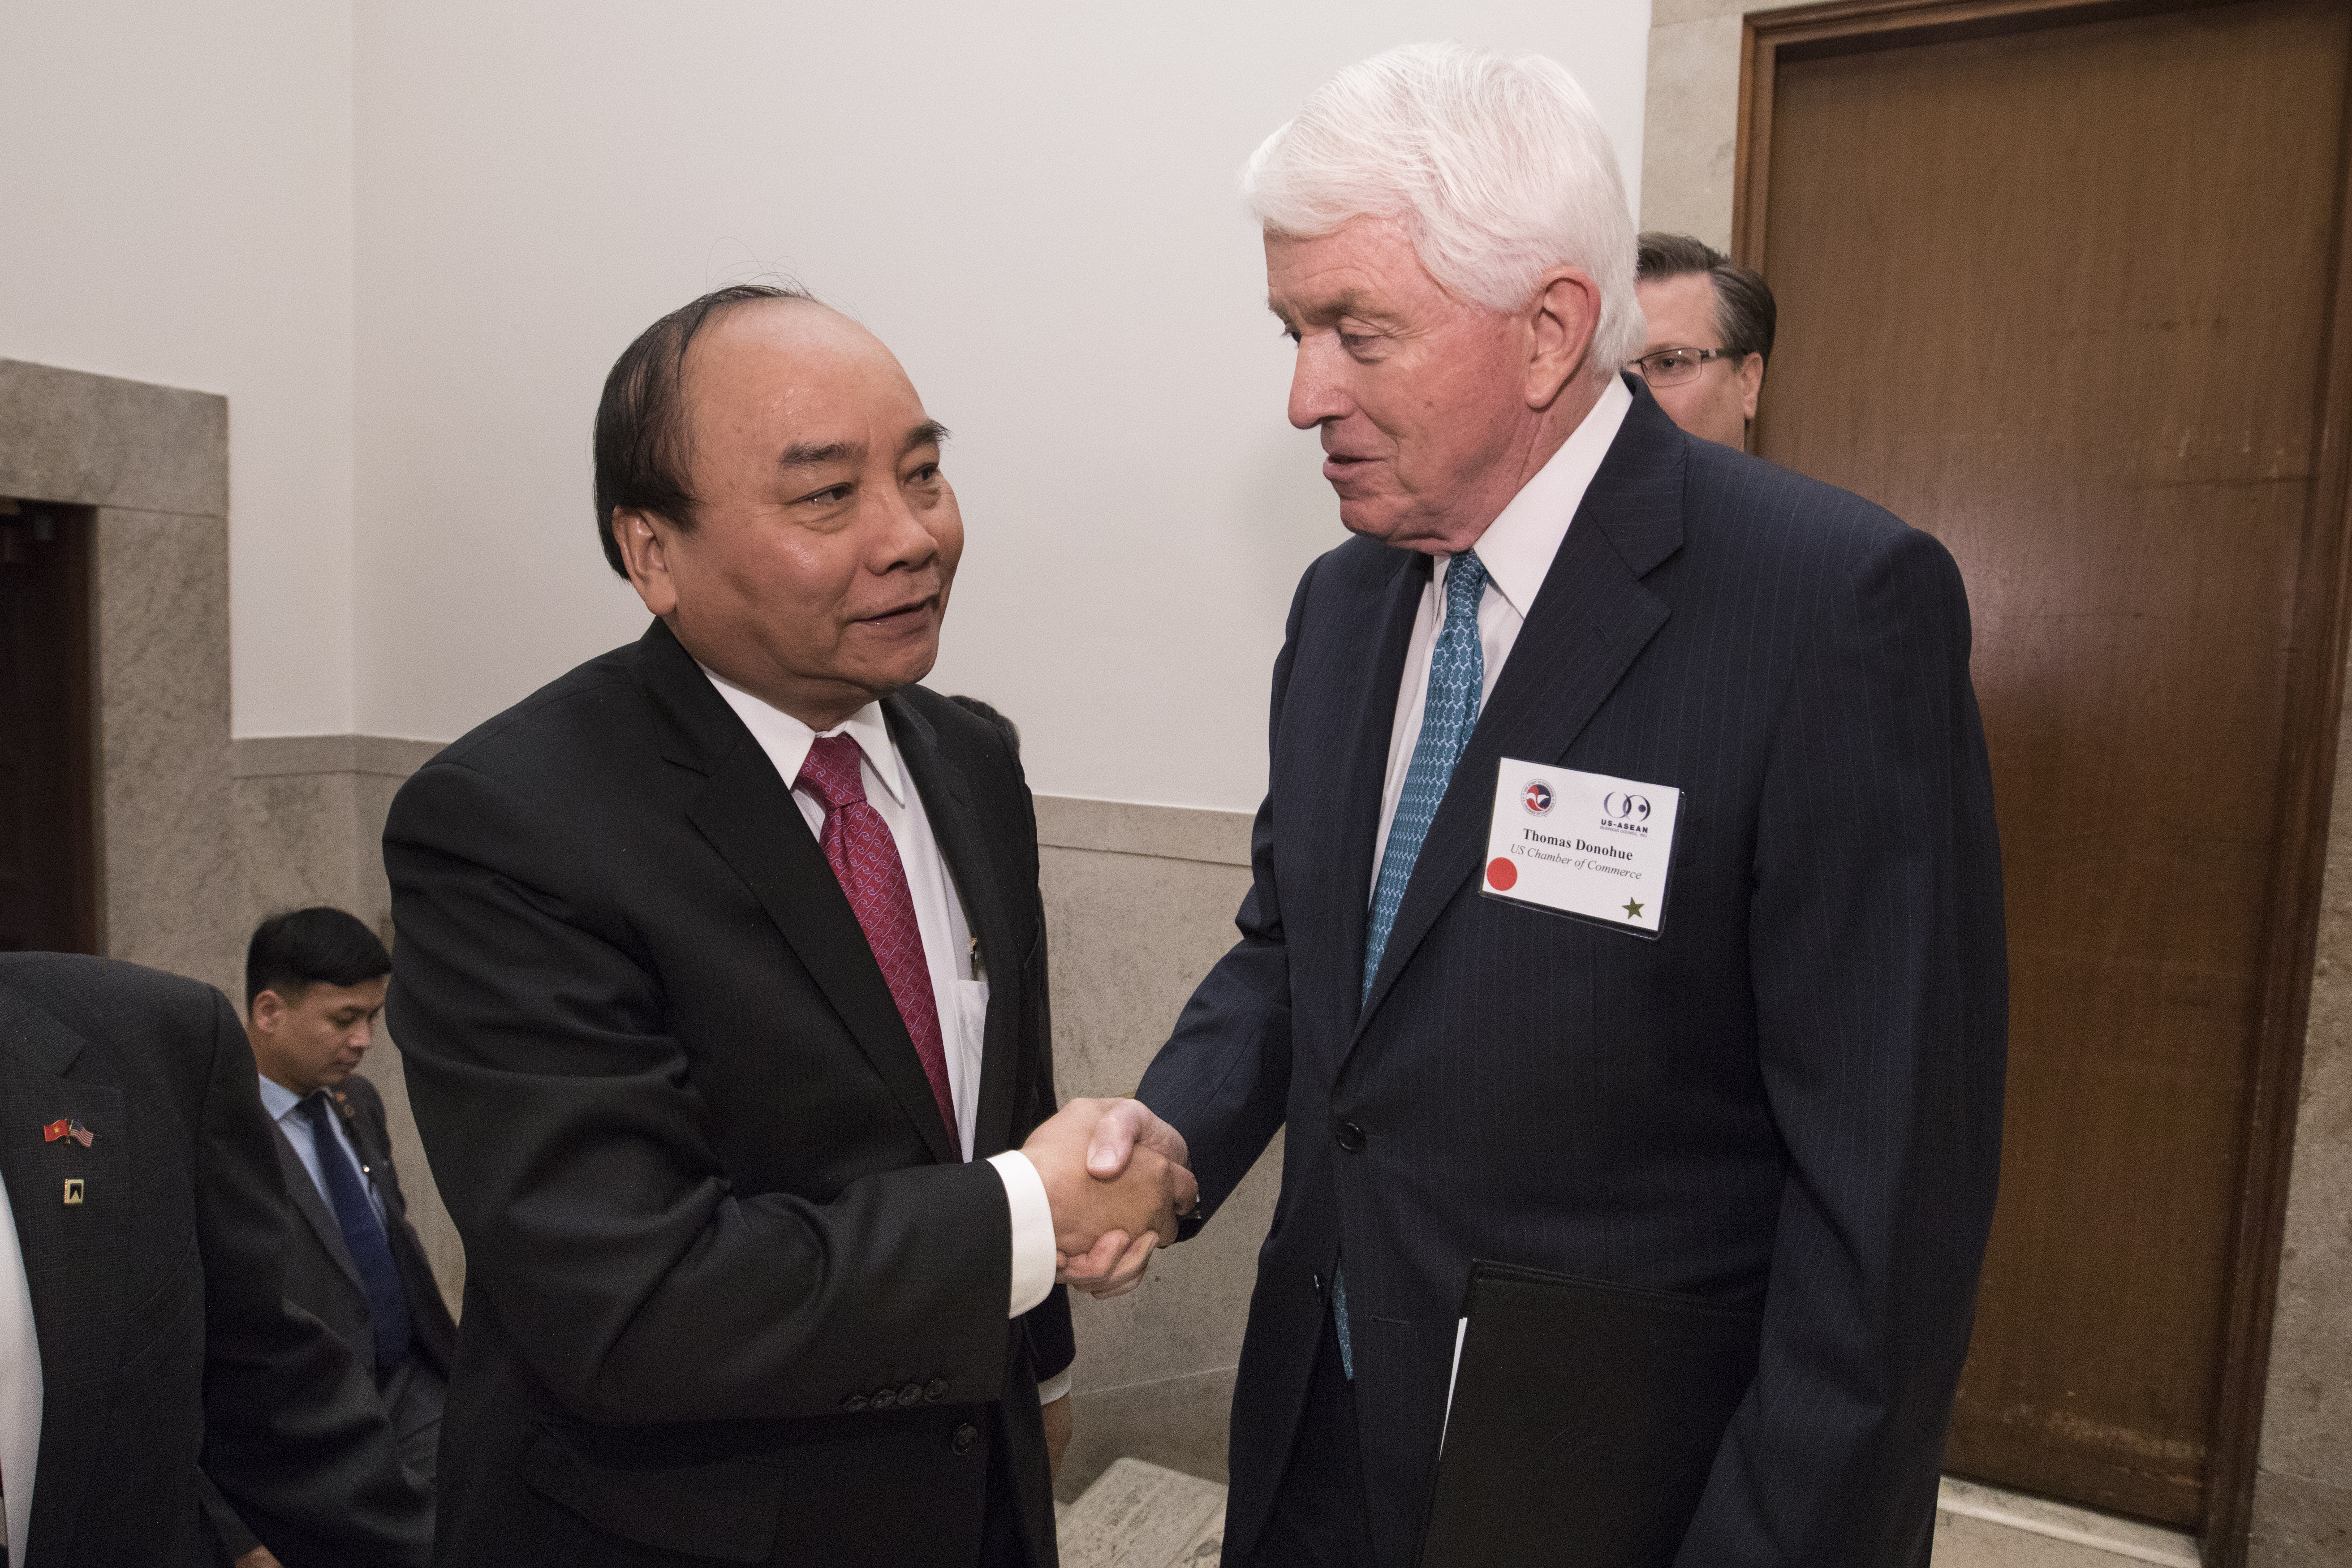 Nguyen Xuan Phuc and Tom Donohue